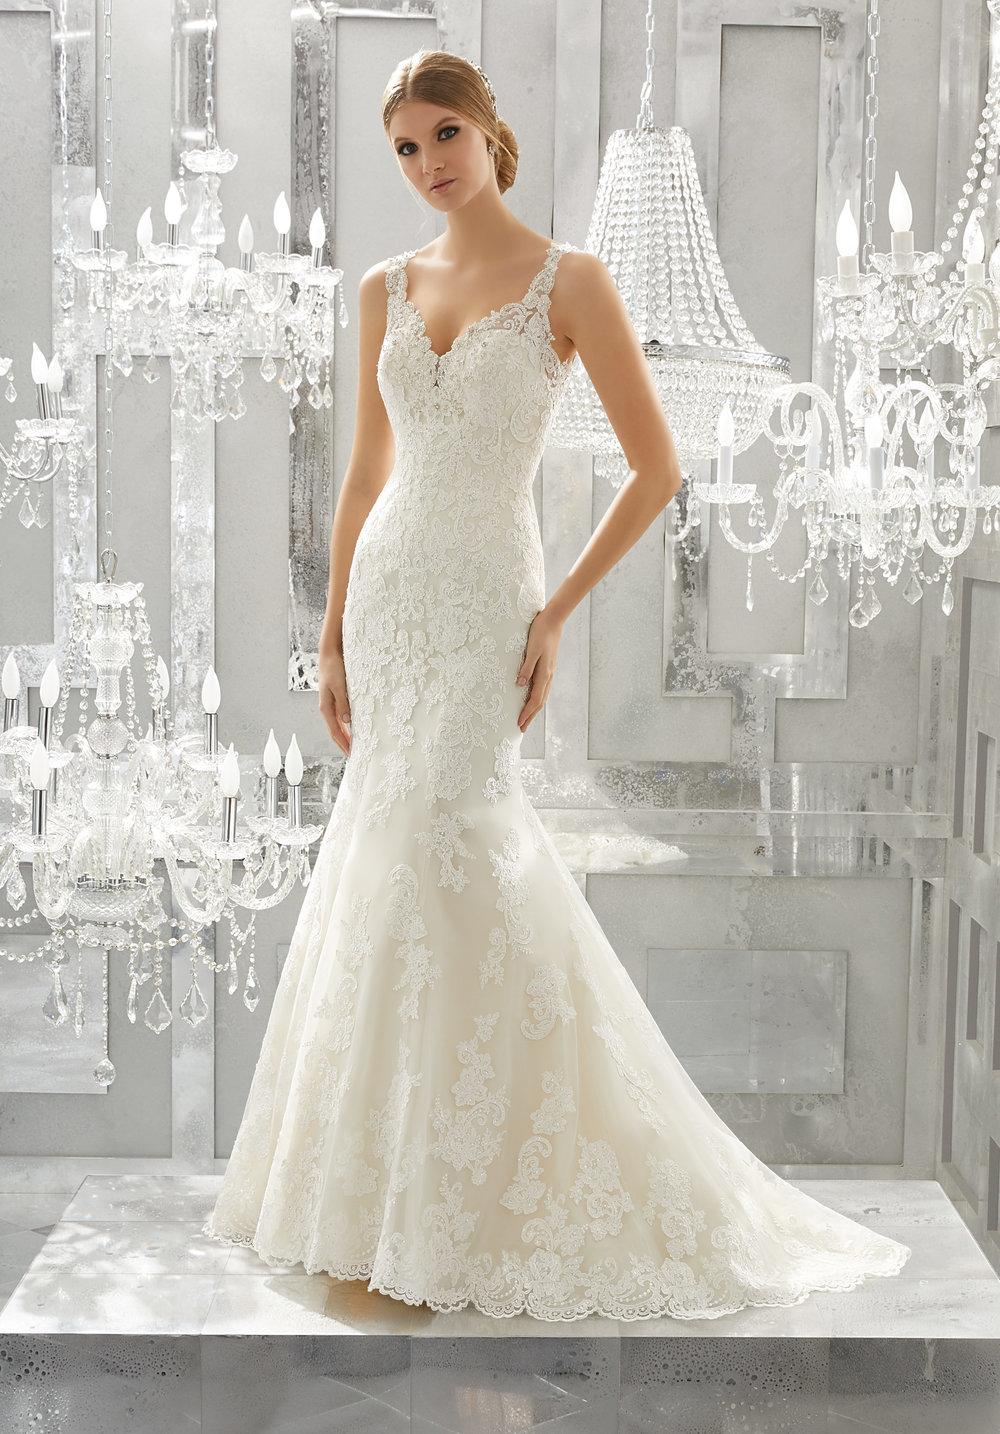 9e24e1dccce Savvi Wedding Blog — Savvi Formalwear and Bridal